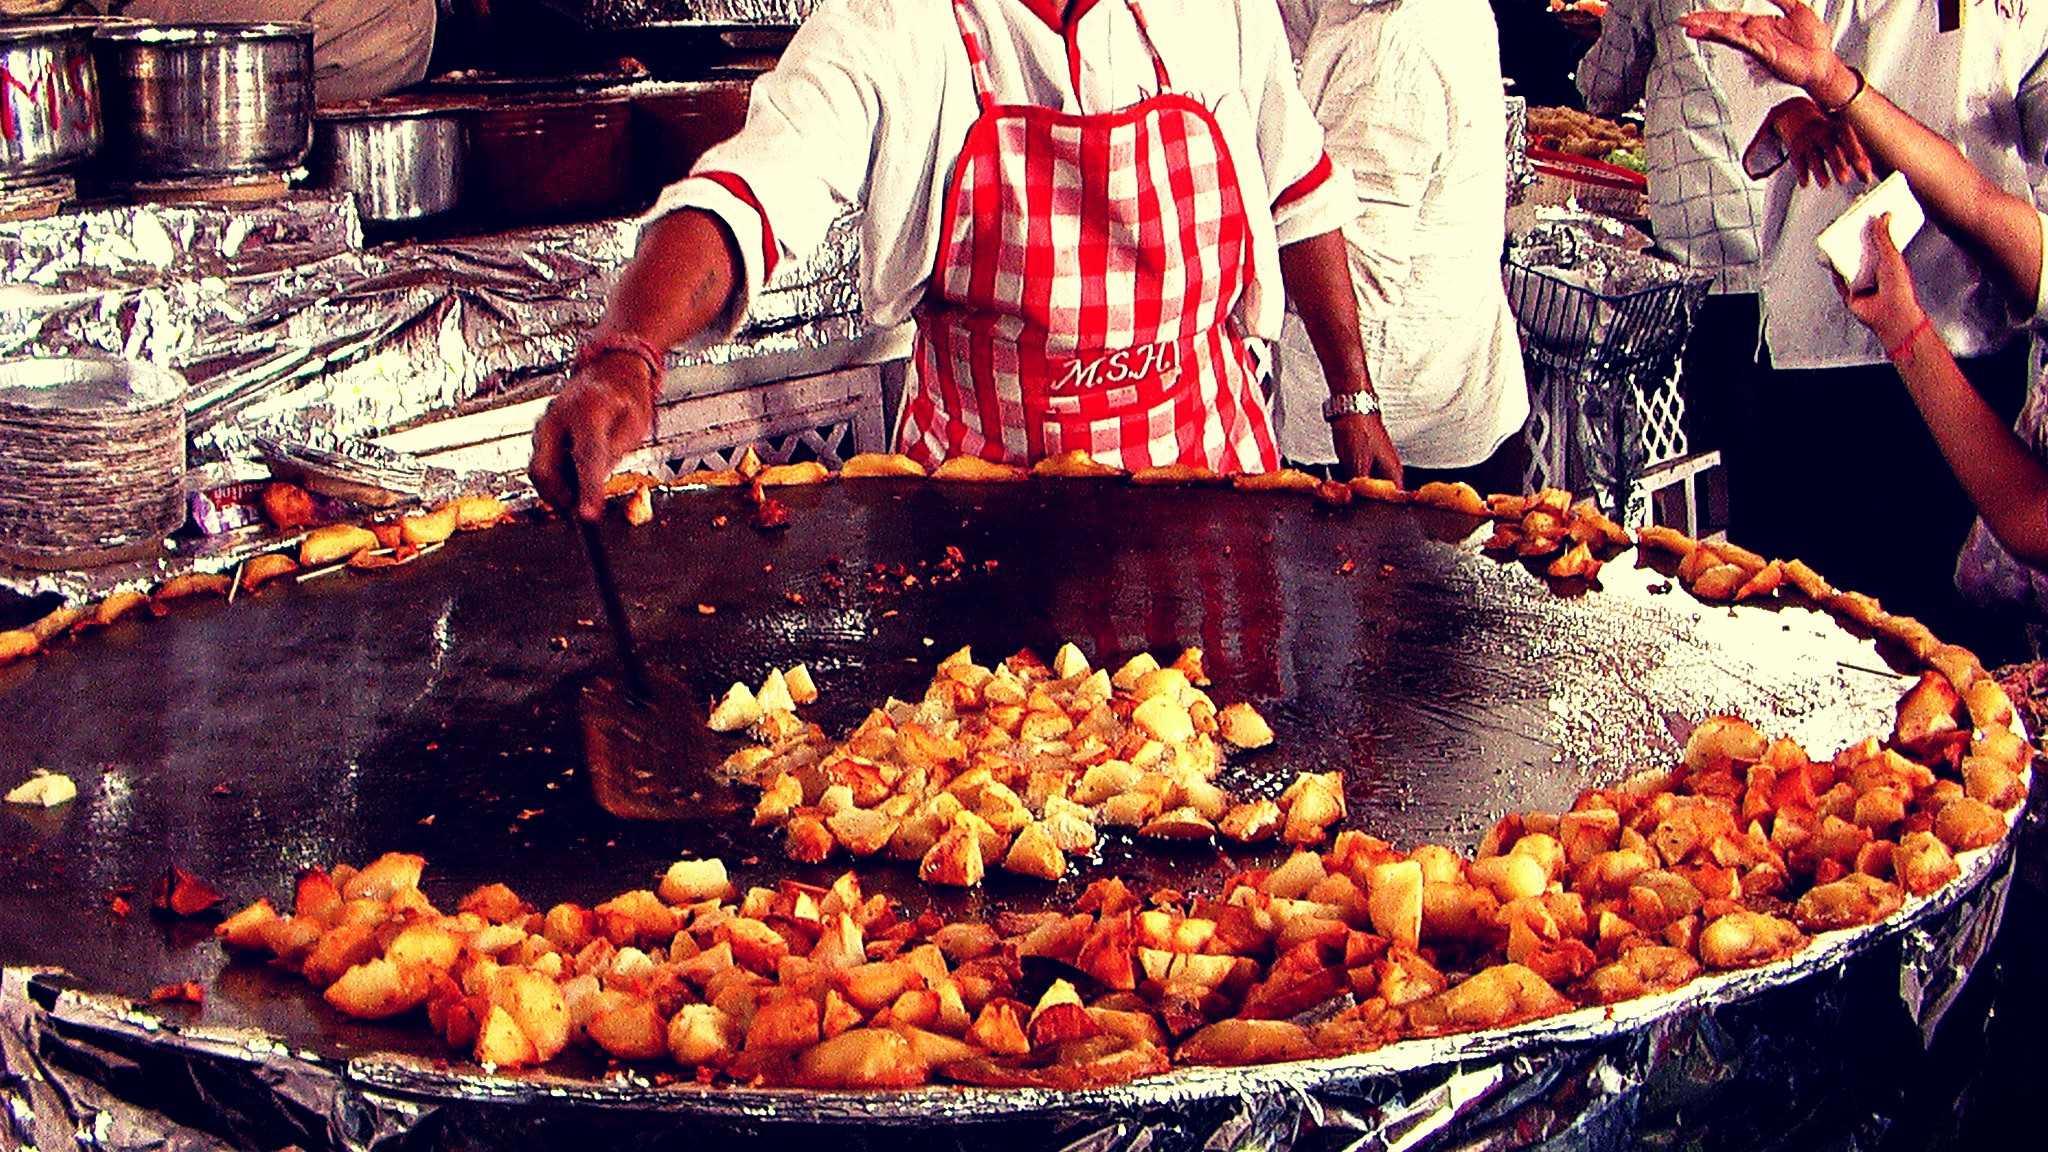 Delhi Street food